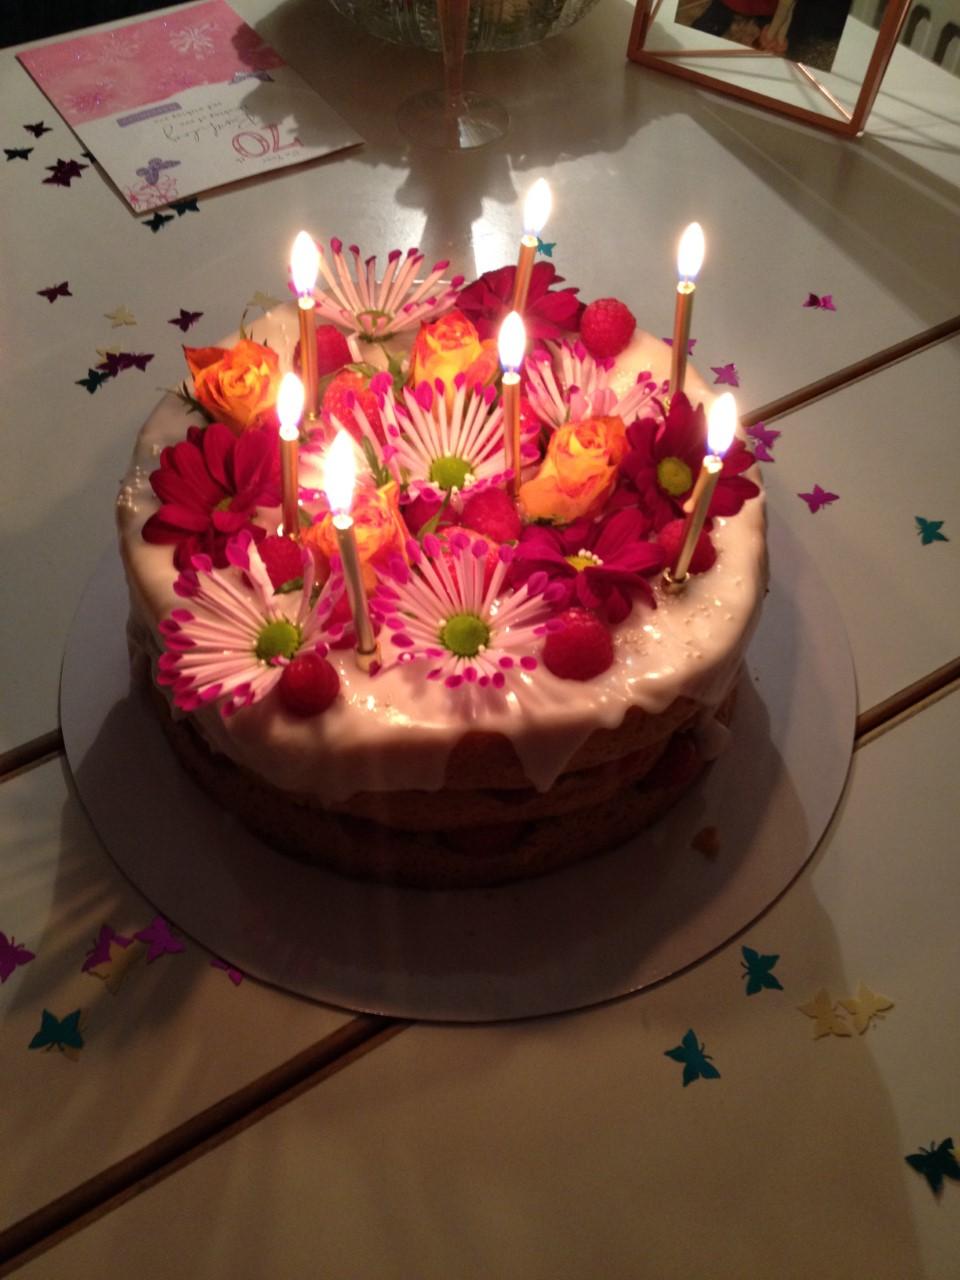 Cake lovers despair as popular Glasgow bakery announces closure